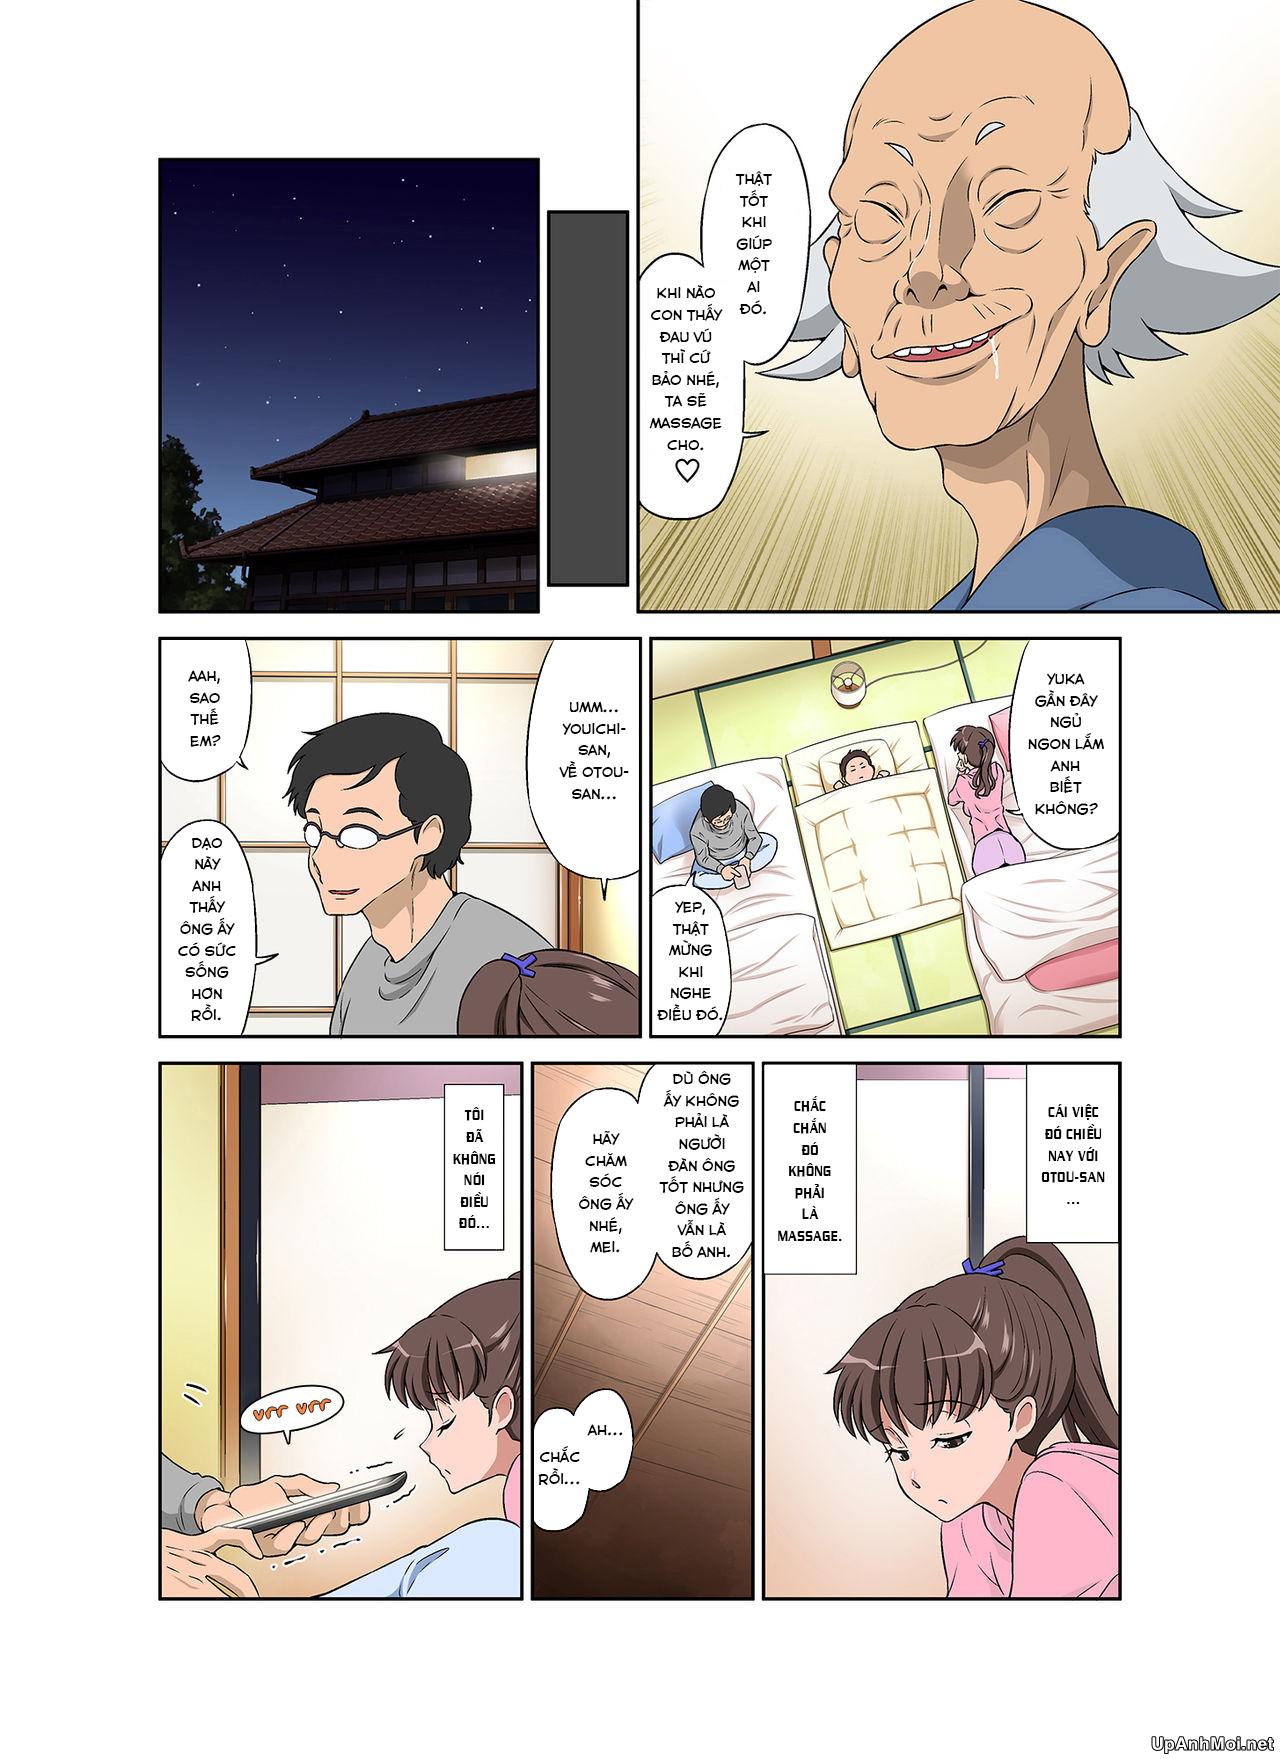 HentaiVN.net - Ảnh 13 - Shinmai Mama-san NTR - 新米ママさんNTR - Oneshot - Phiên bản da trắng